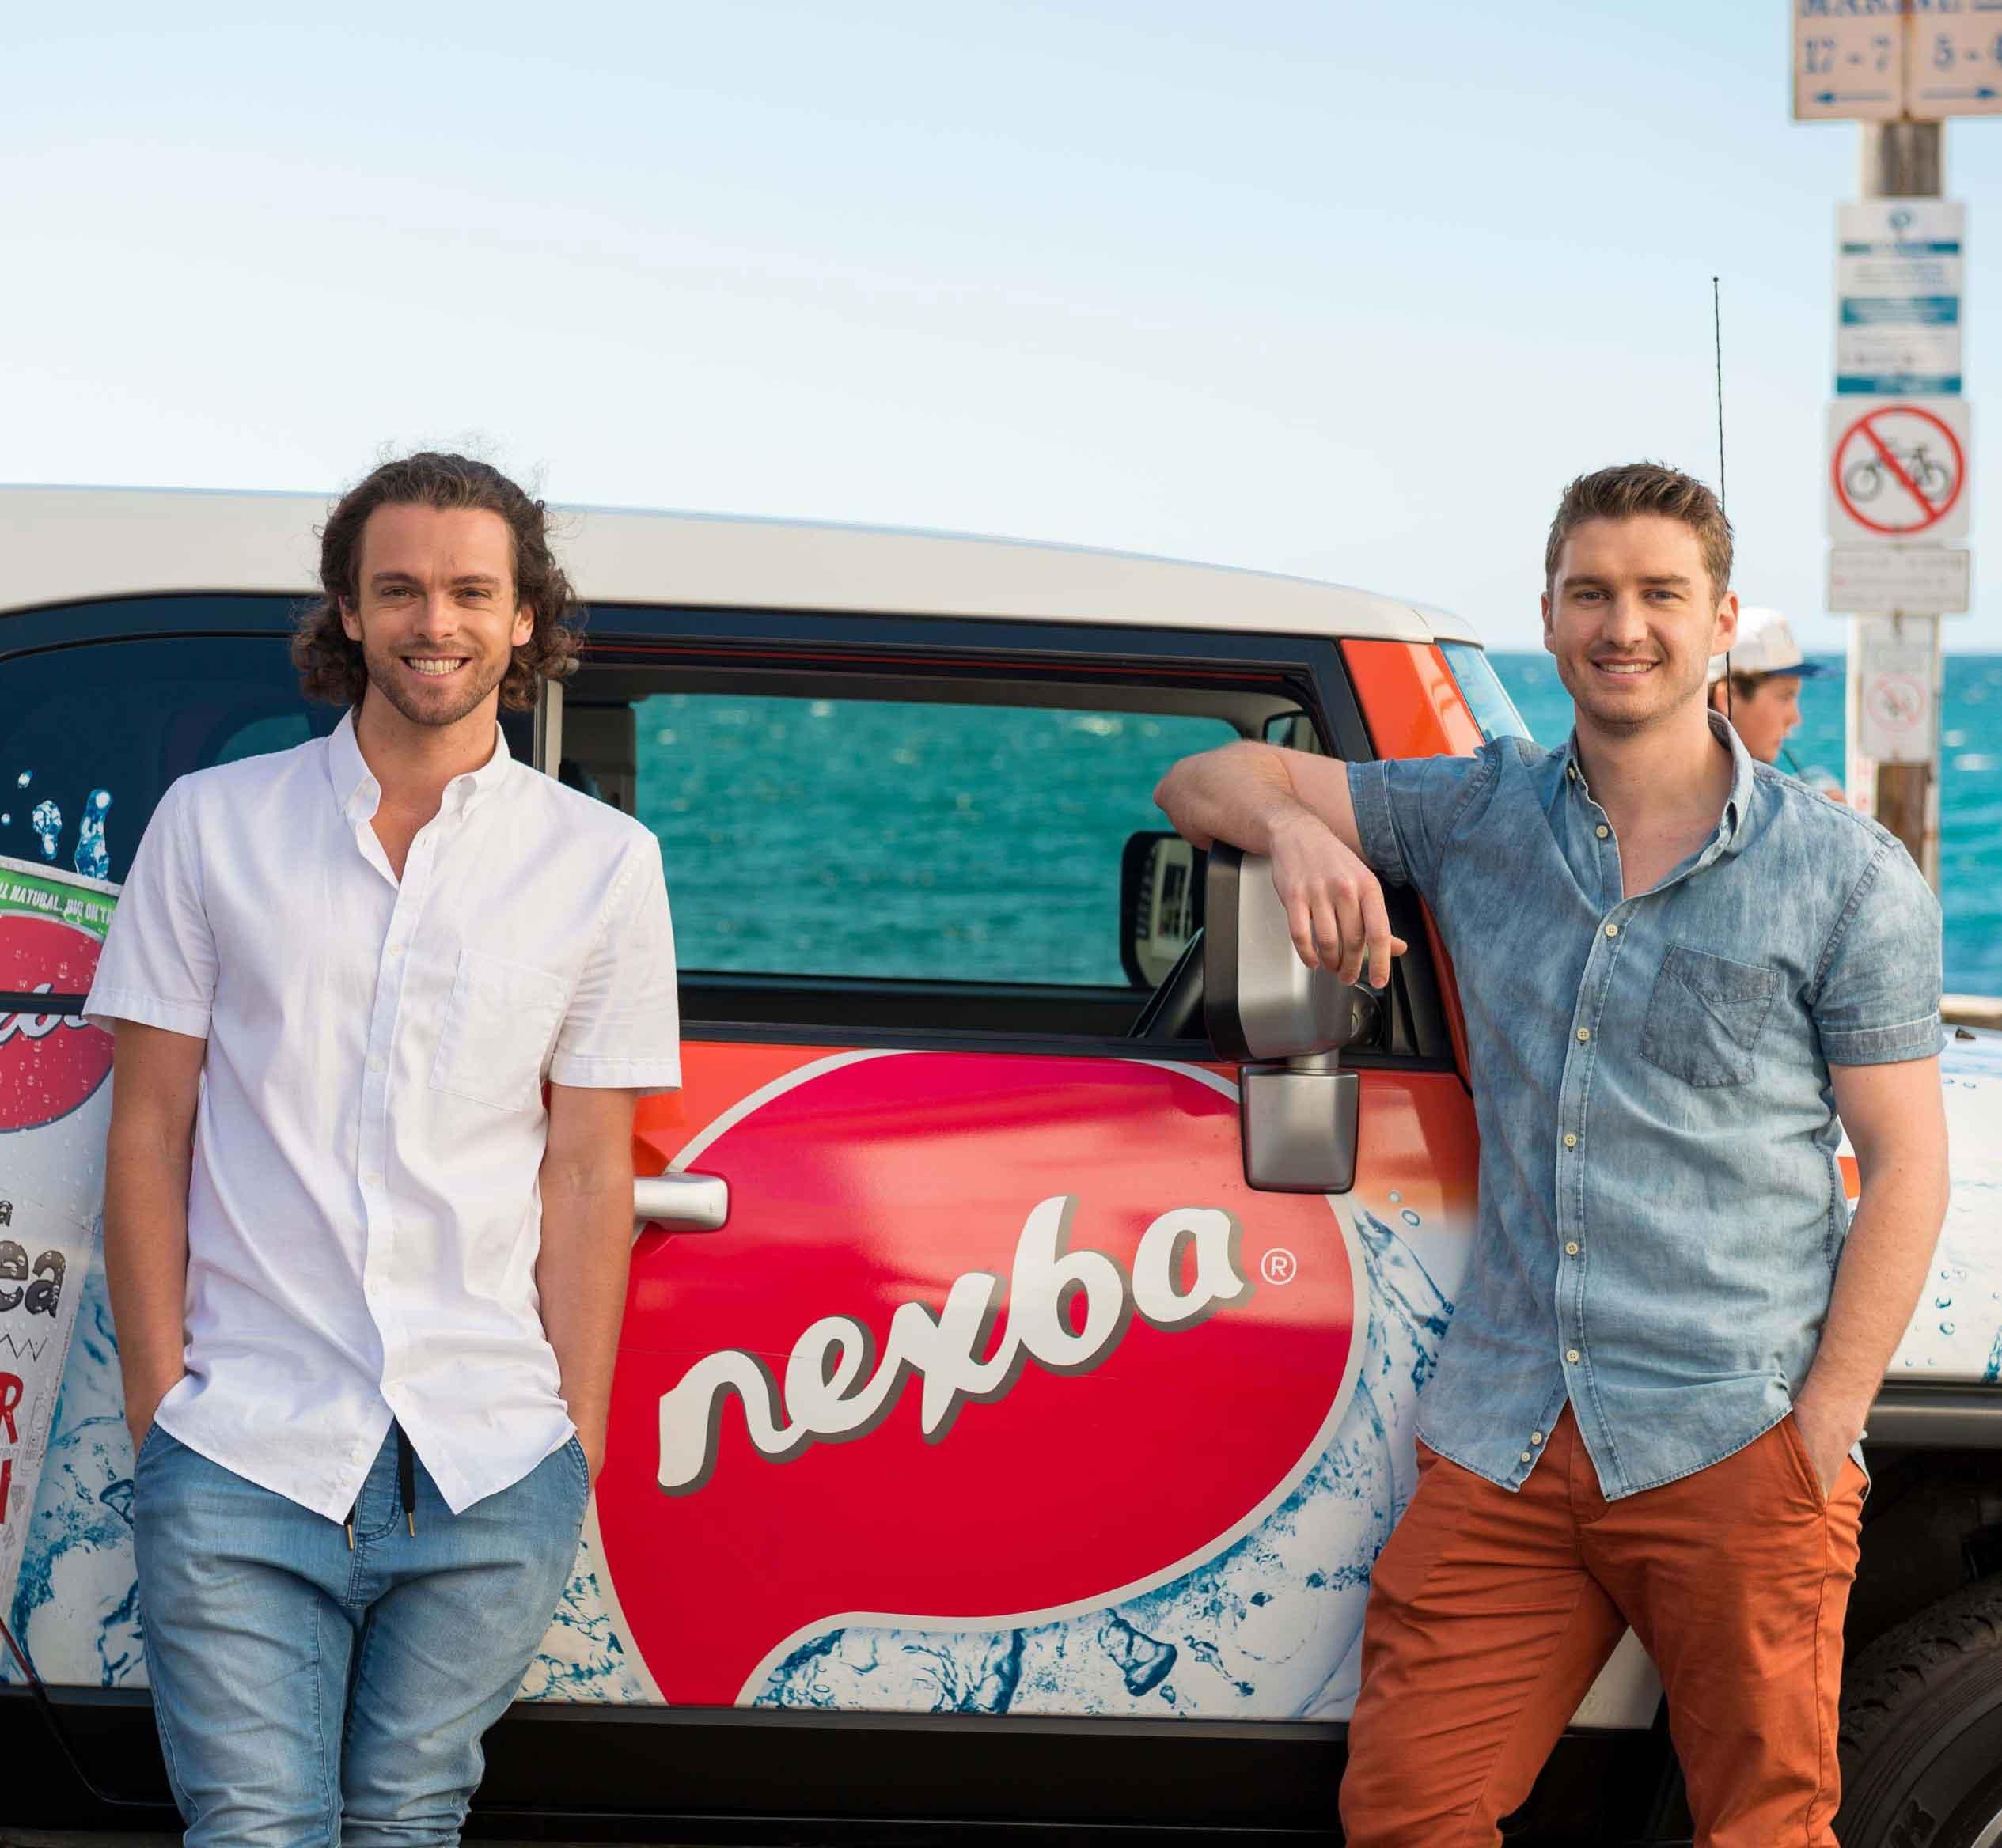 Nexba co-founders Drew-Bilbe-and-Troy-Douglas-Shelley-Beach 3